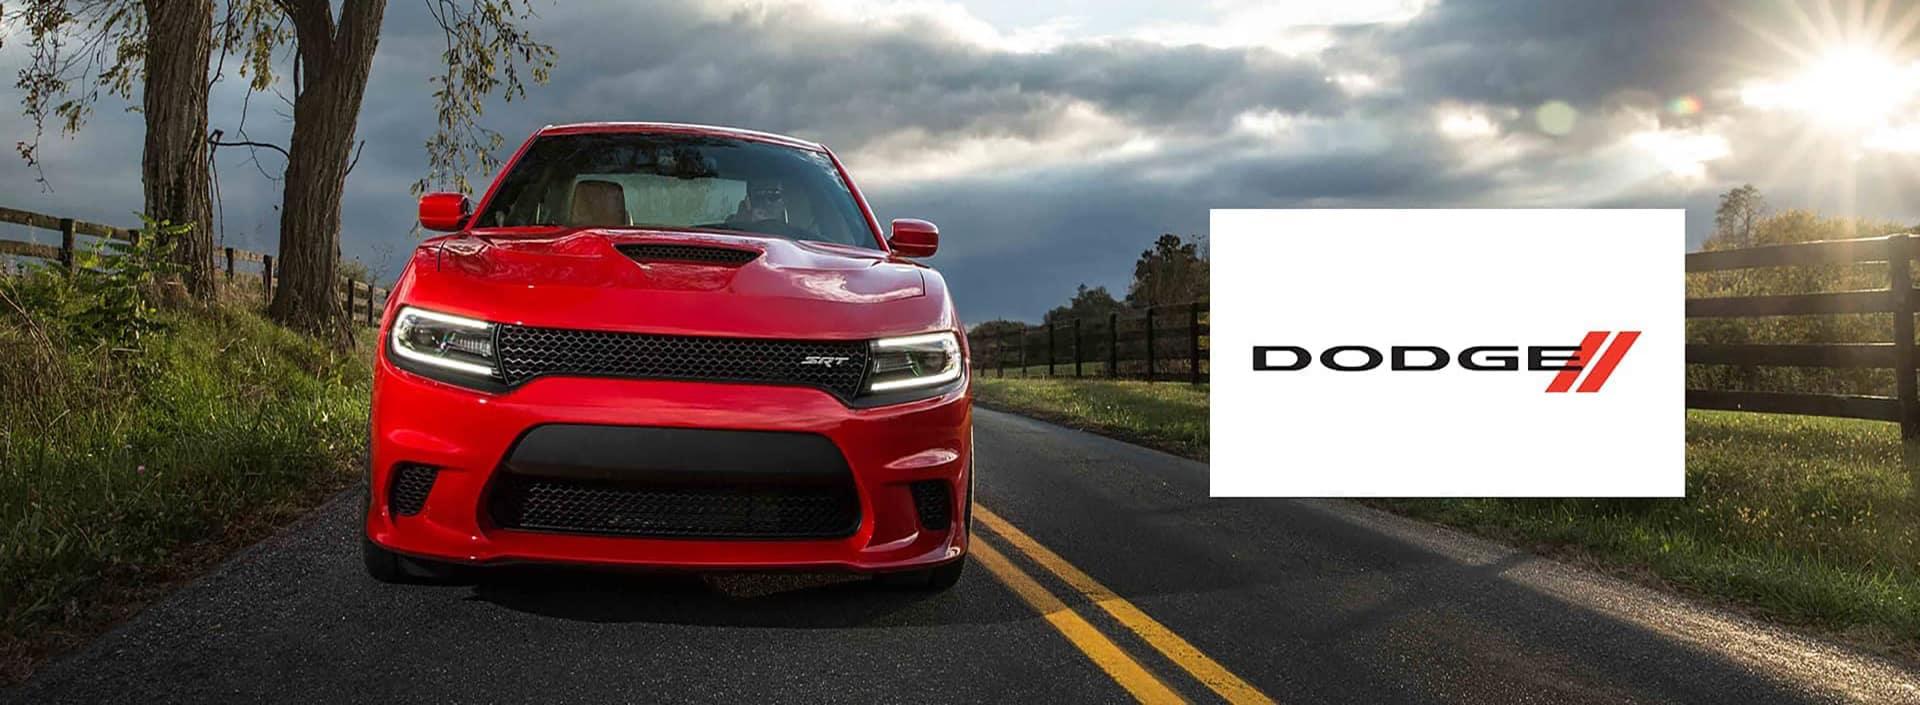 Dodge banner